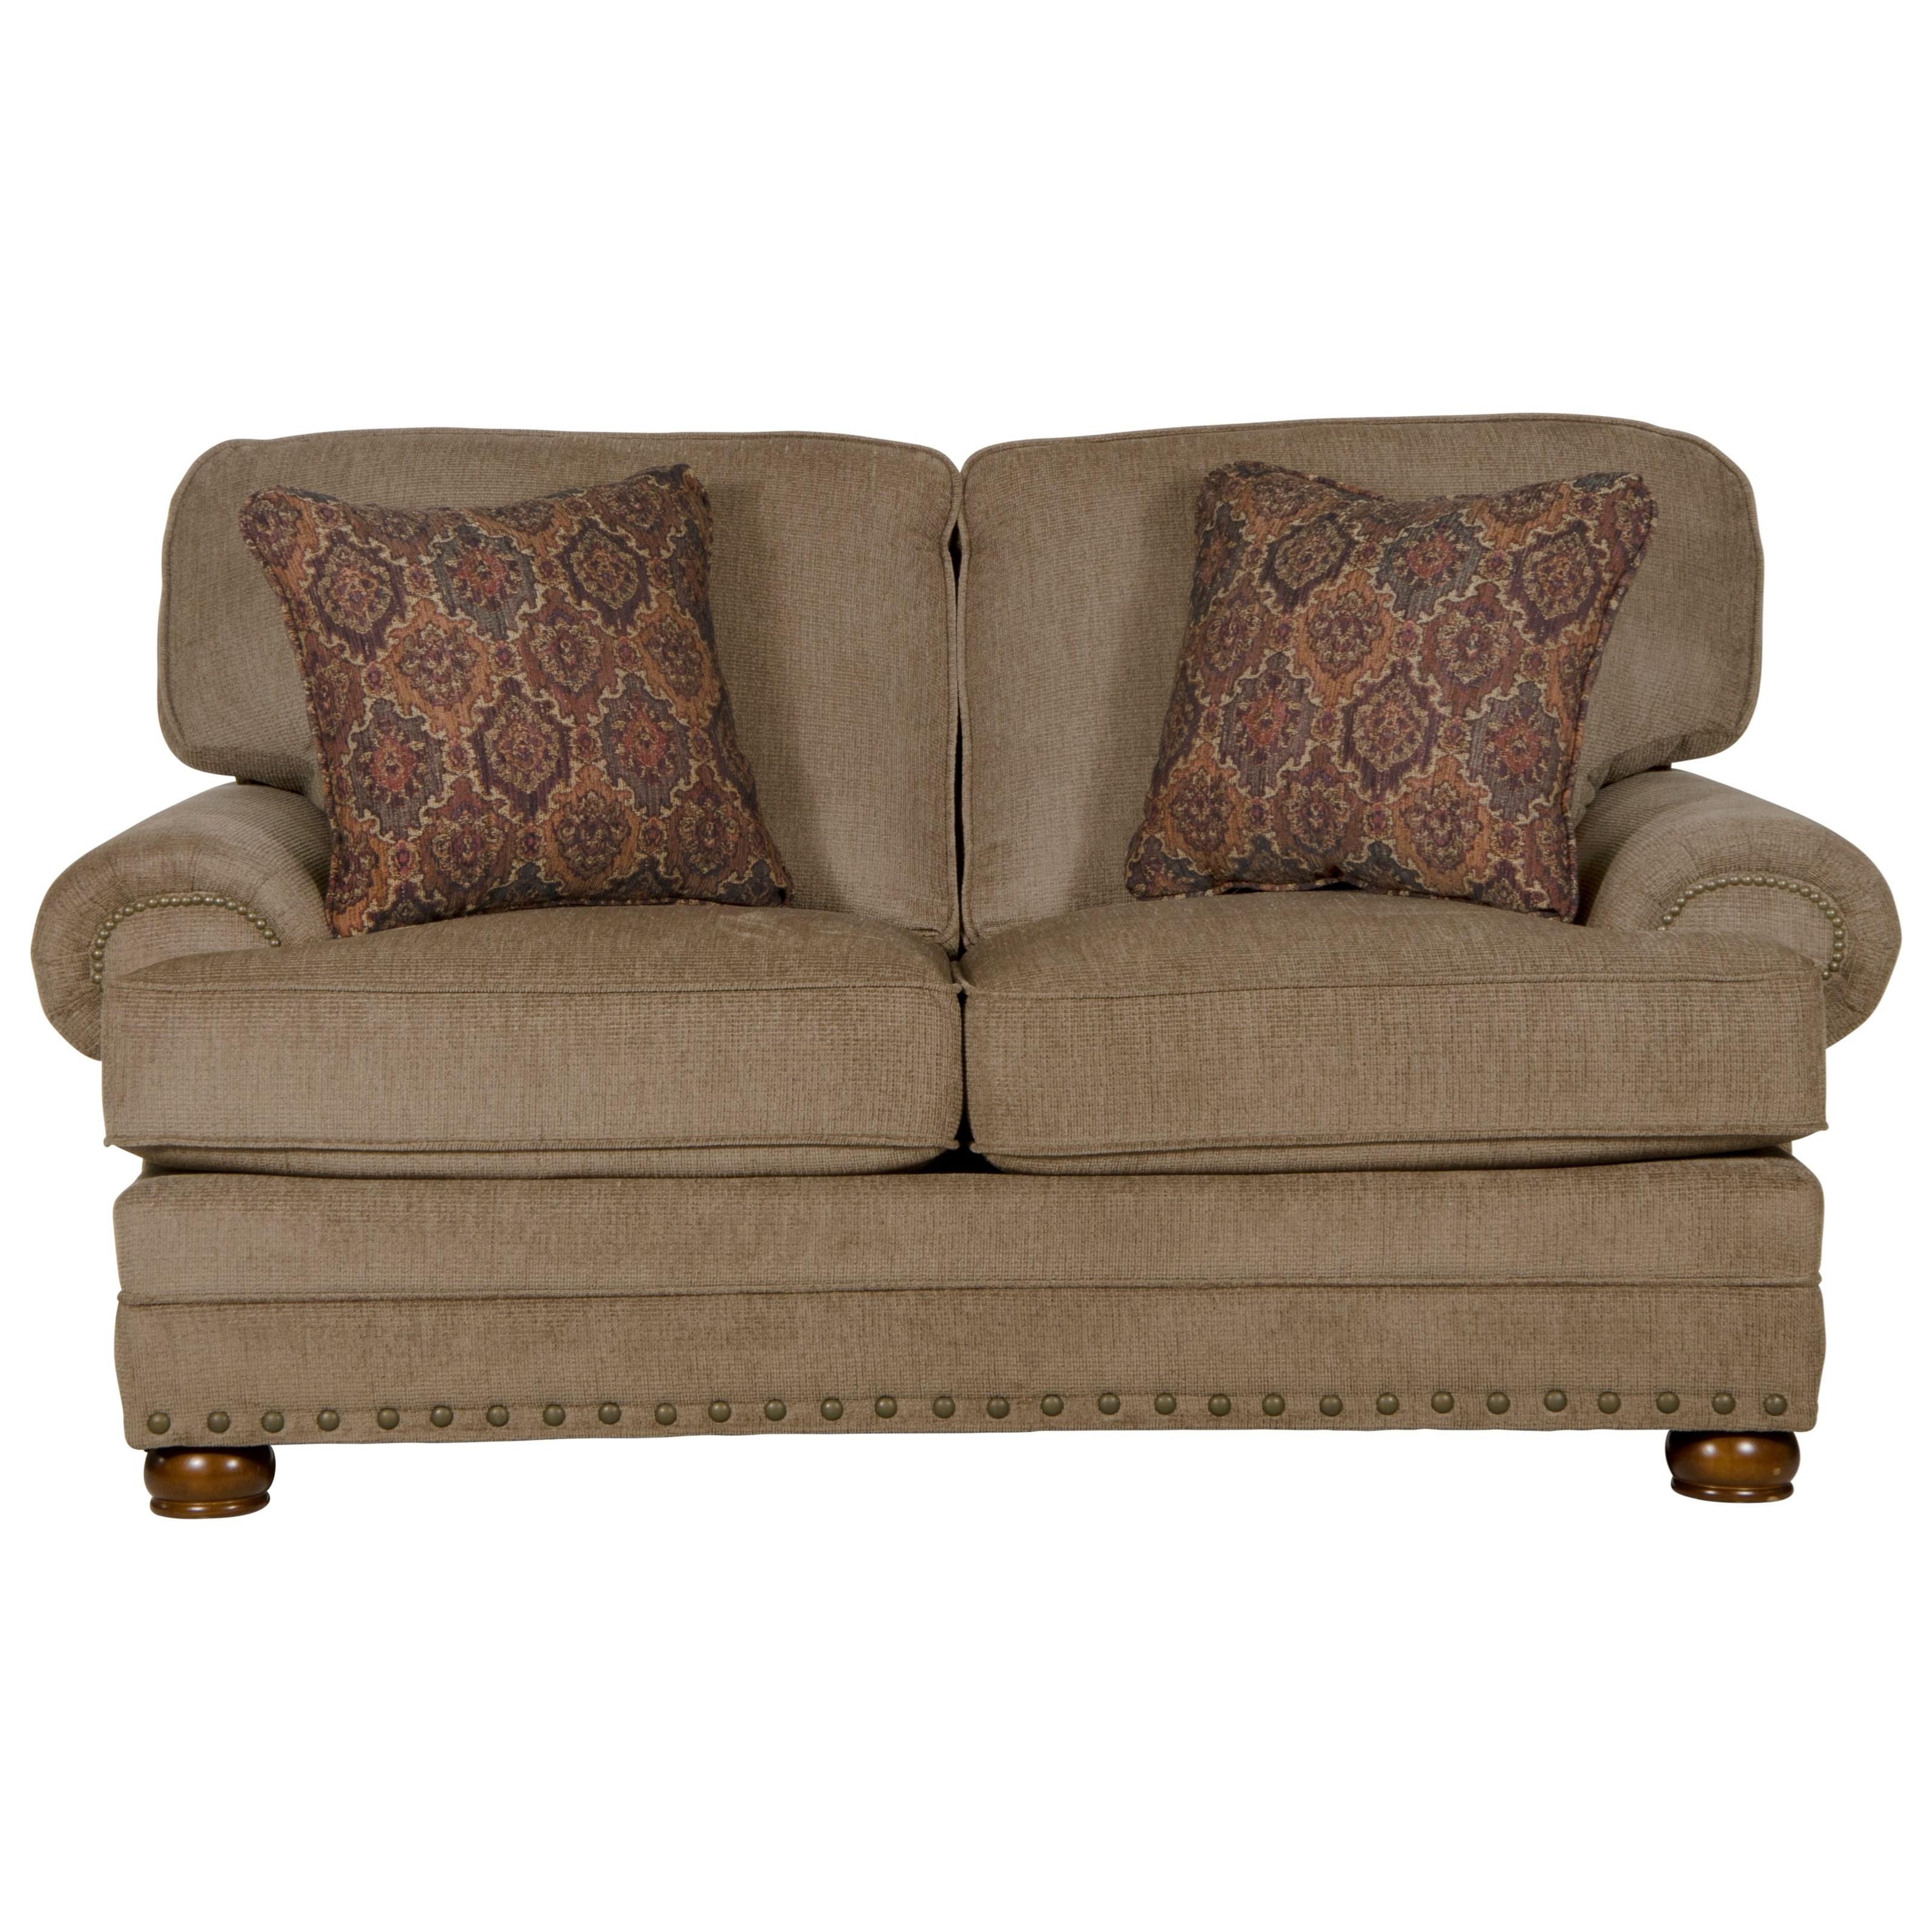 Singletary Loveseat by Jackson Furniture at Zak's Home